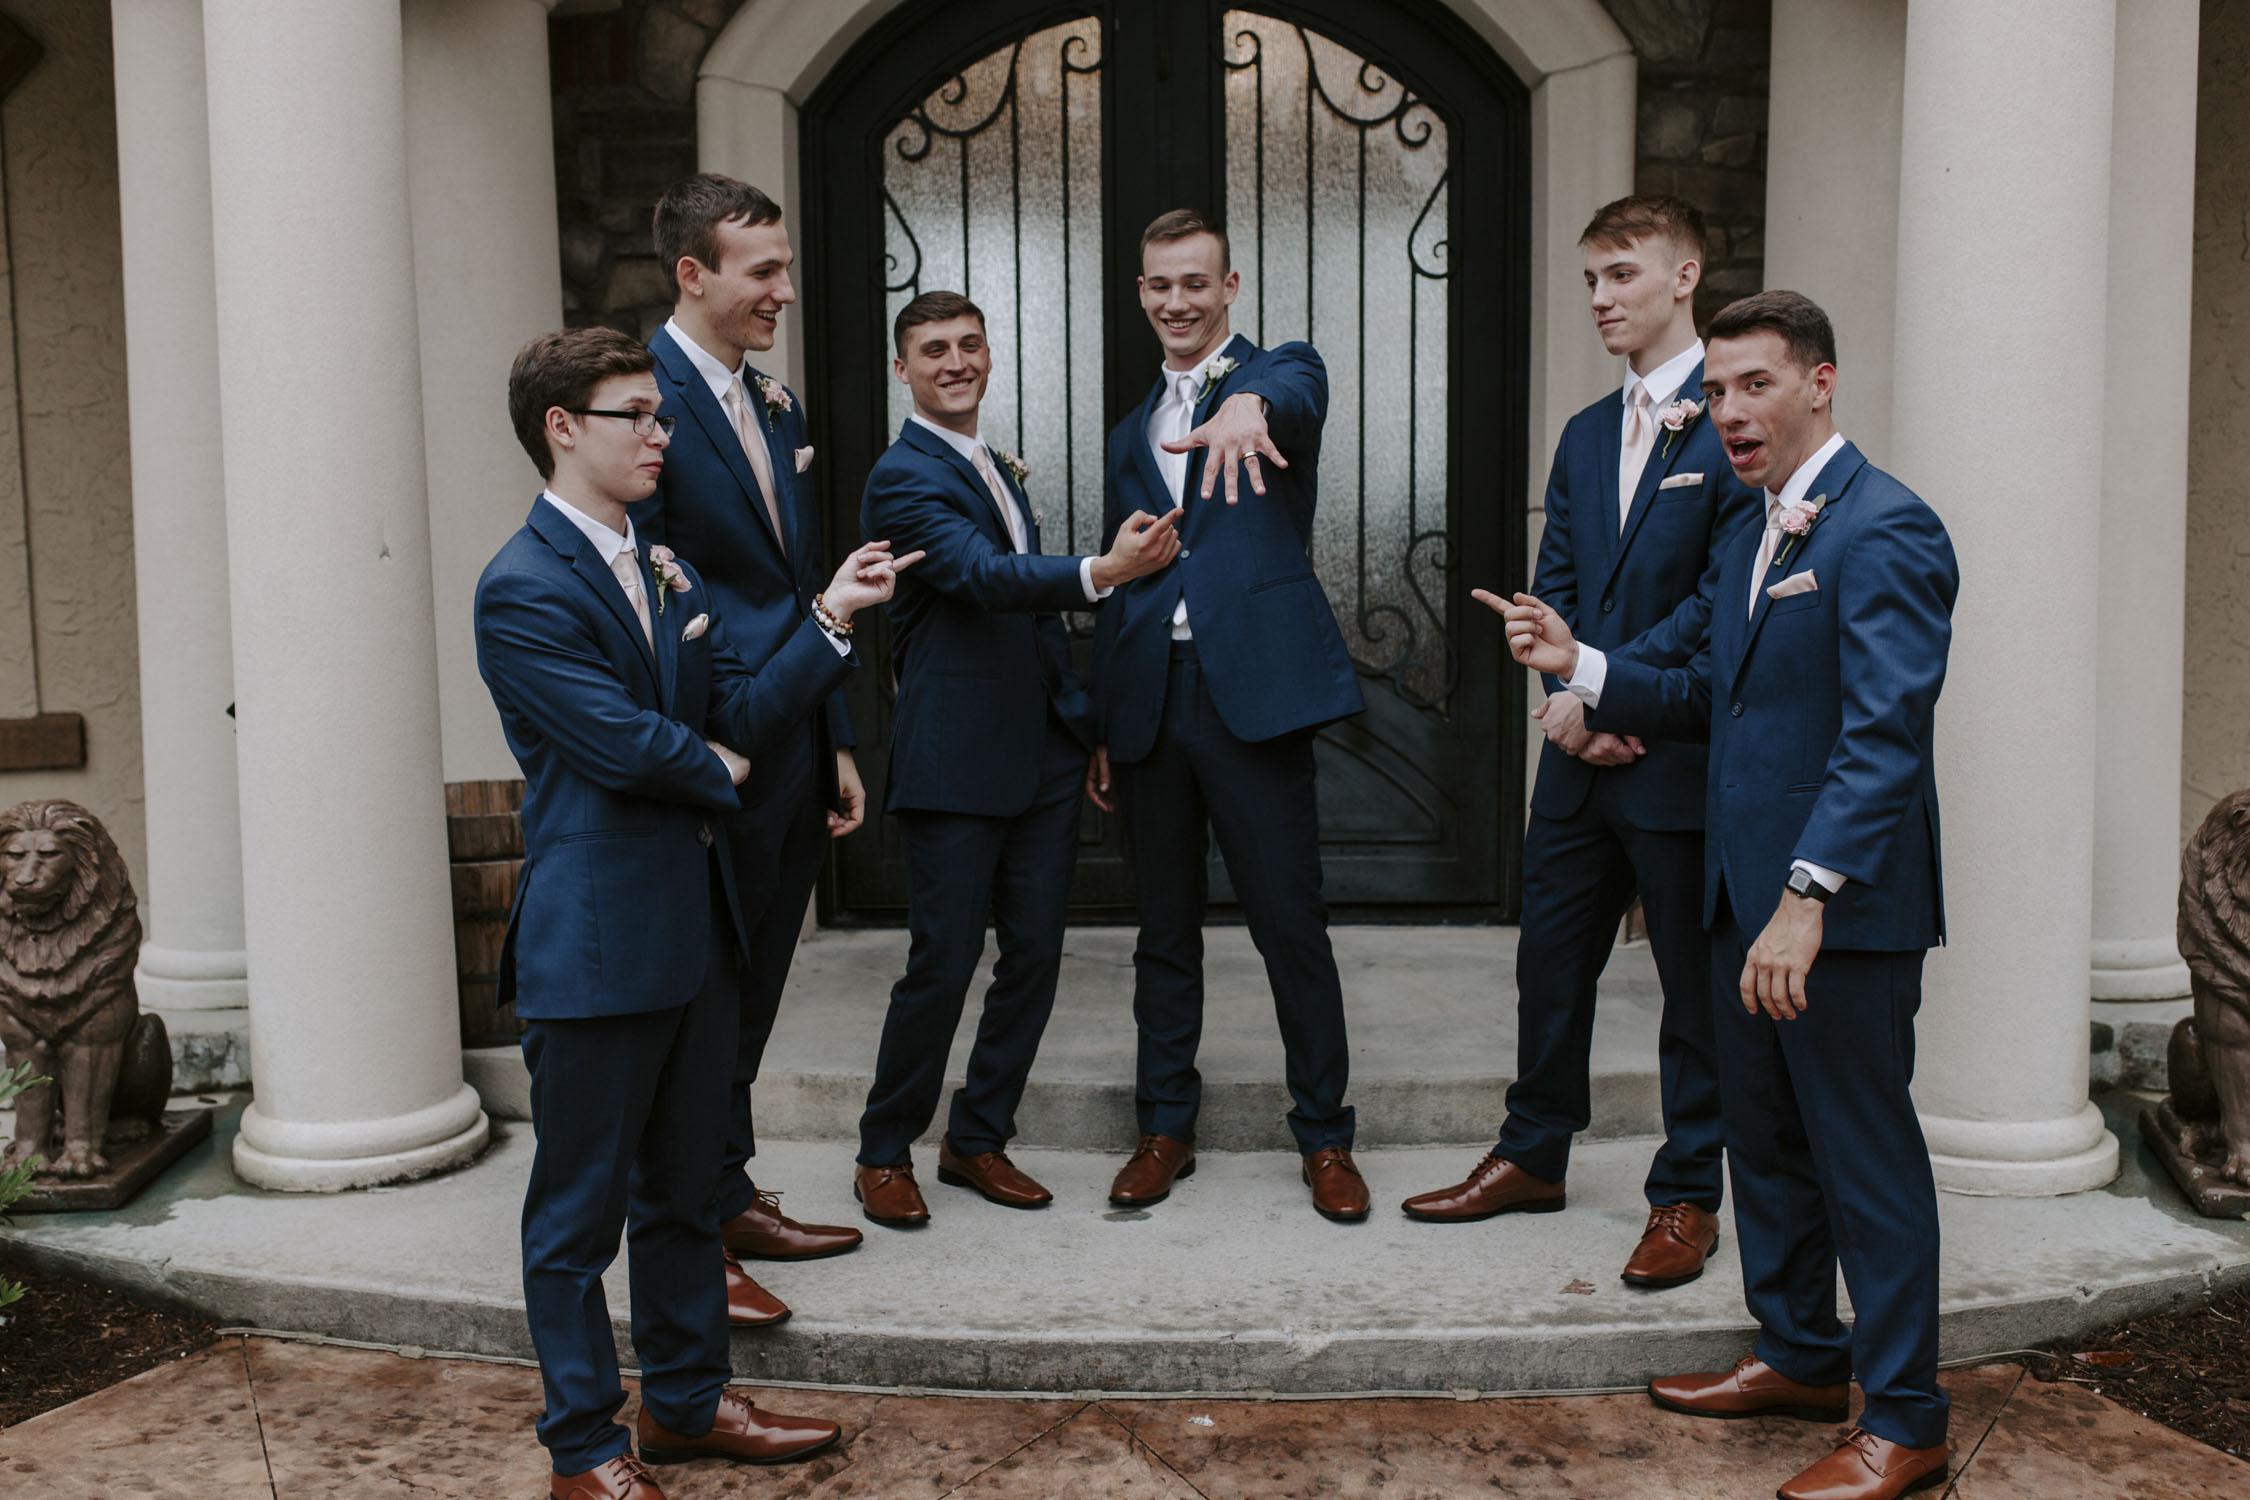 Rainy Bella Collina Wedding Party Portraits - Groomsmen | Kayli LaFon Photography, Greensboro Winston-Salem NC Wedding Photographer